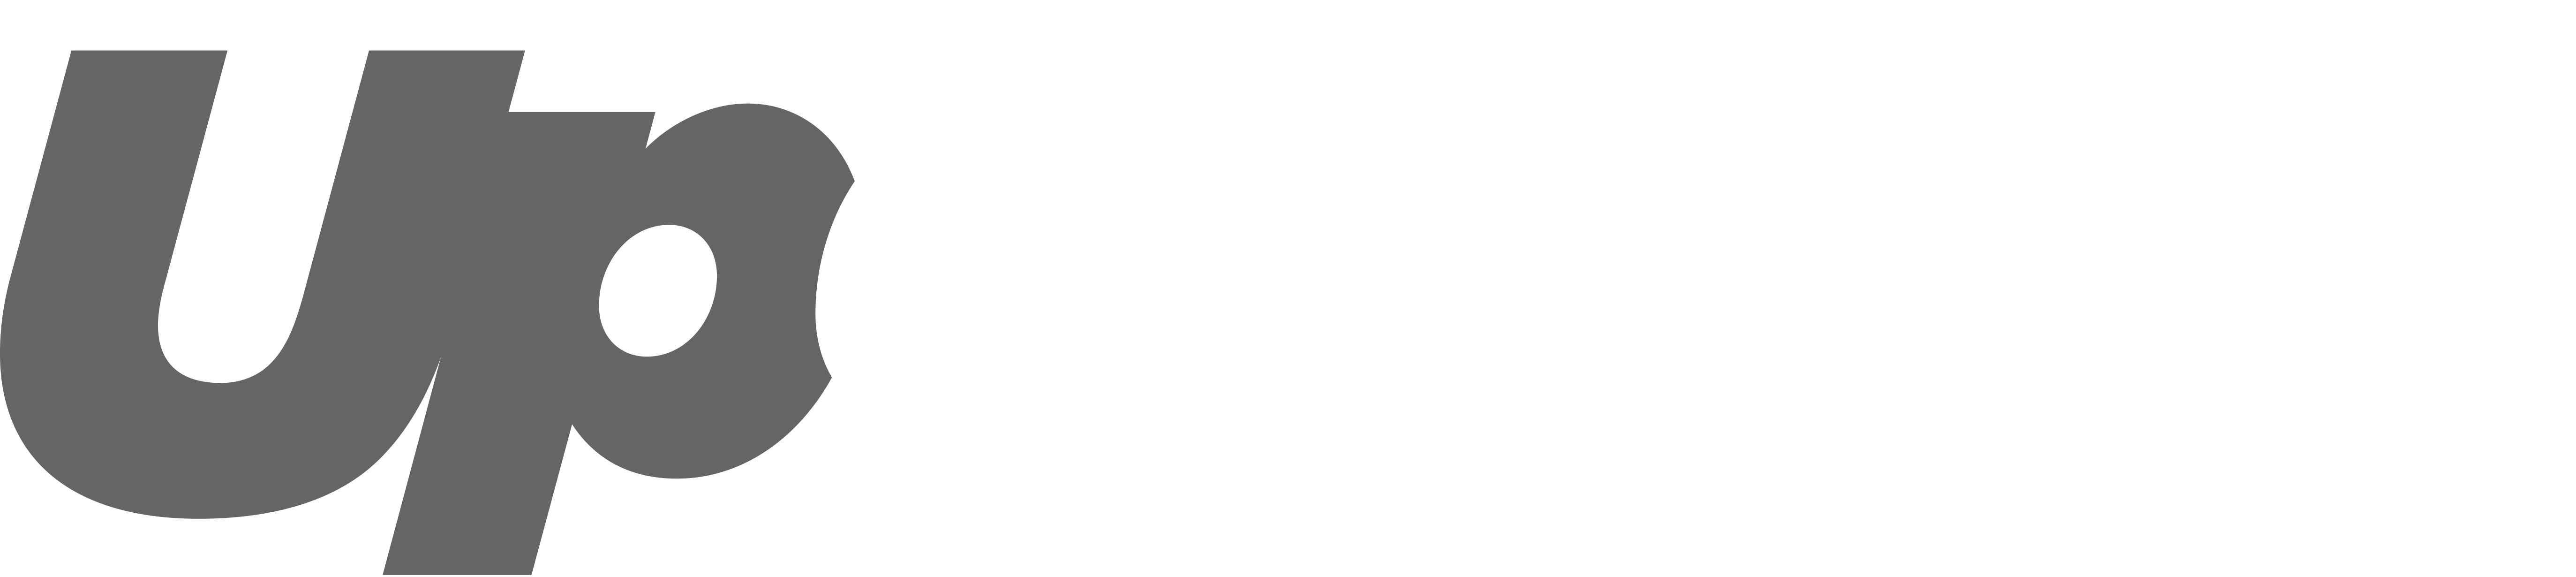 logo upgreyd